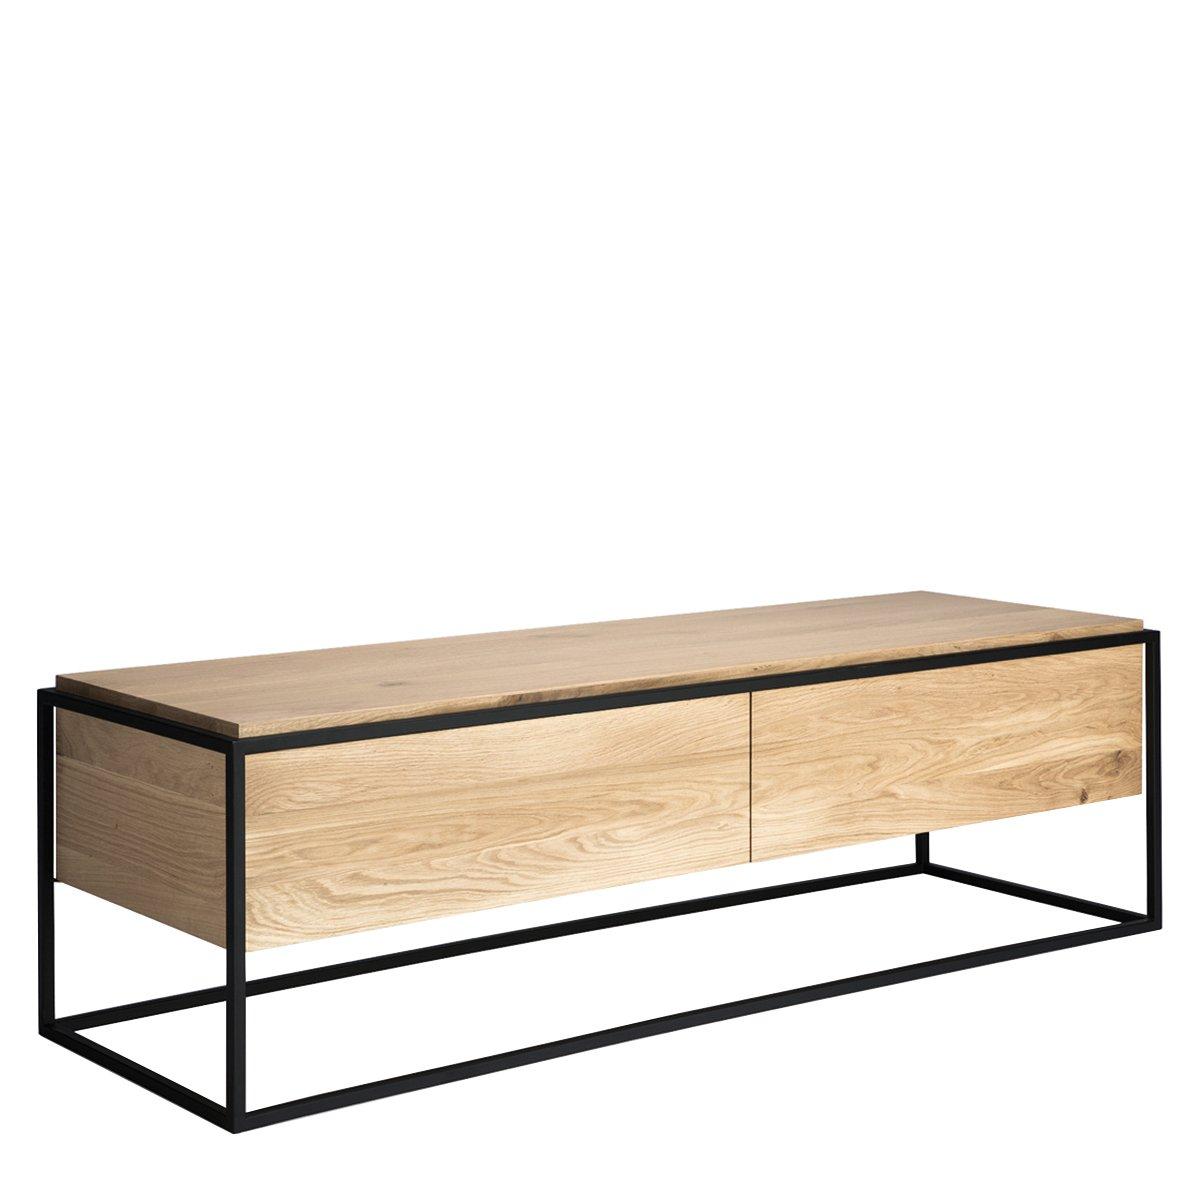 Ethnicraft Monolit TV-meubel